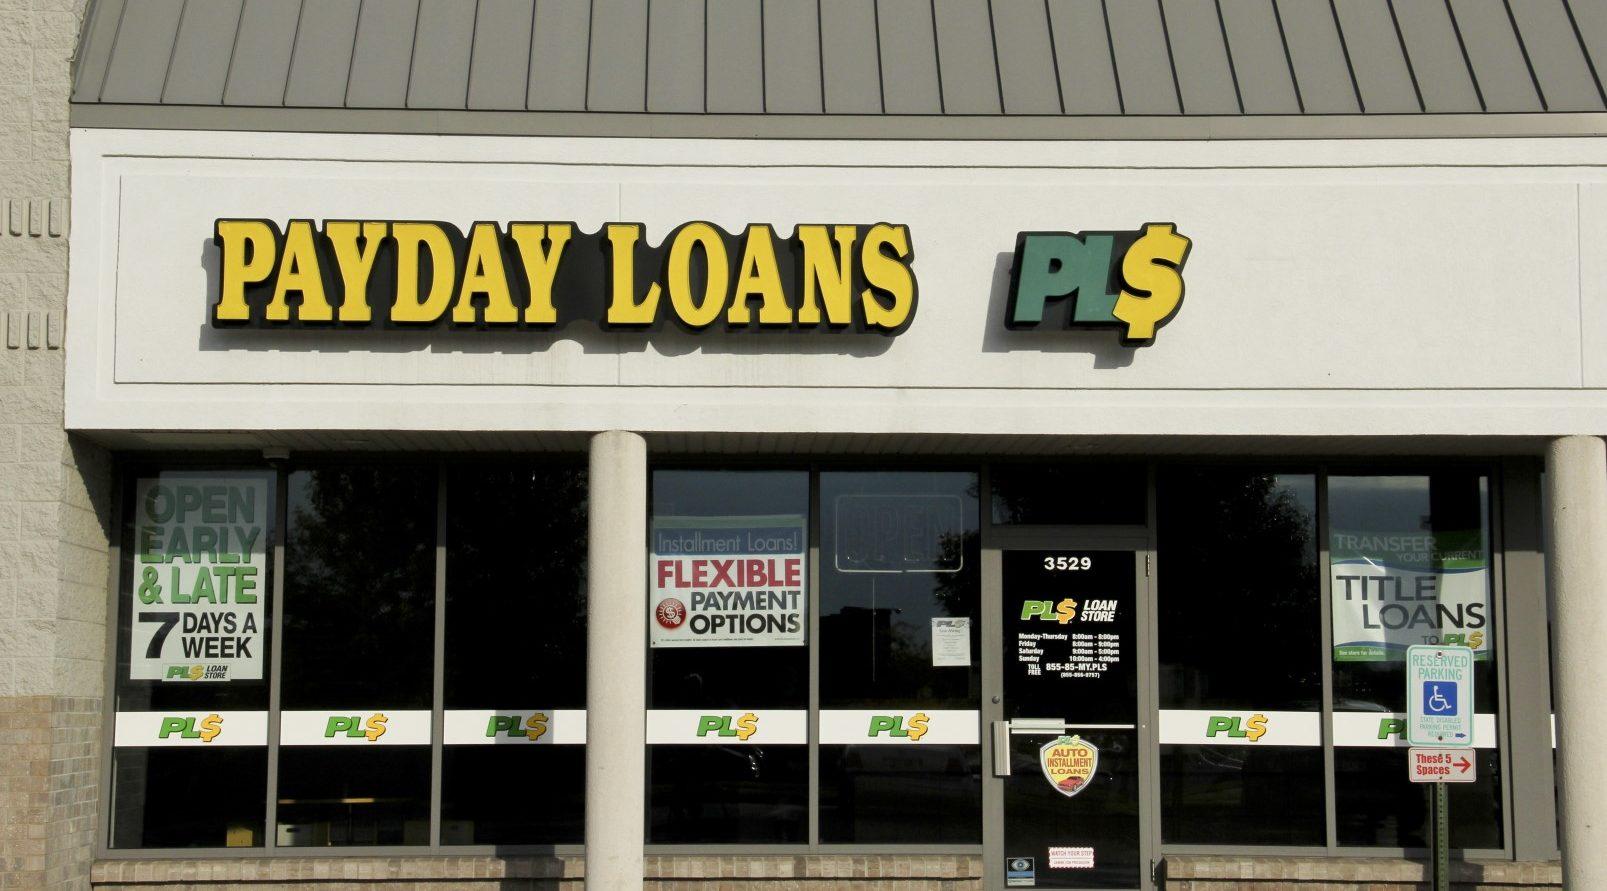 payday-loans-Large-e1470783329628.jpg